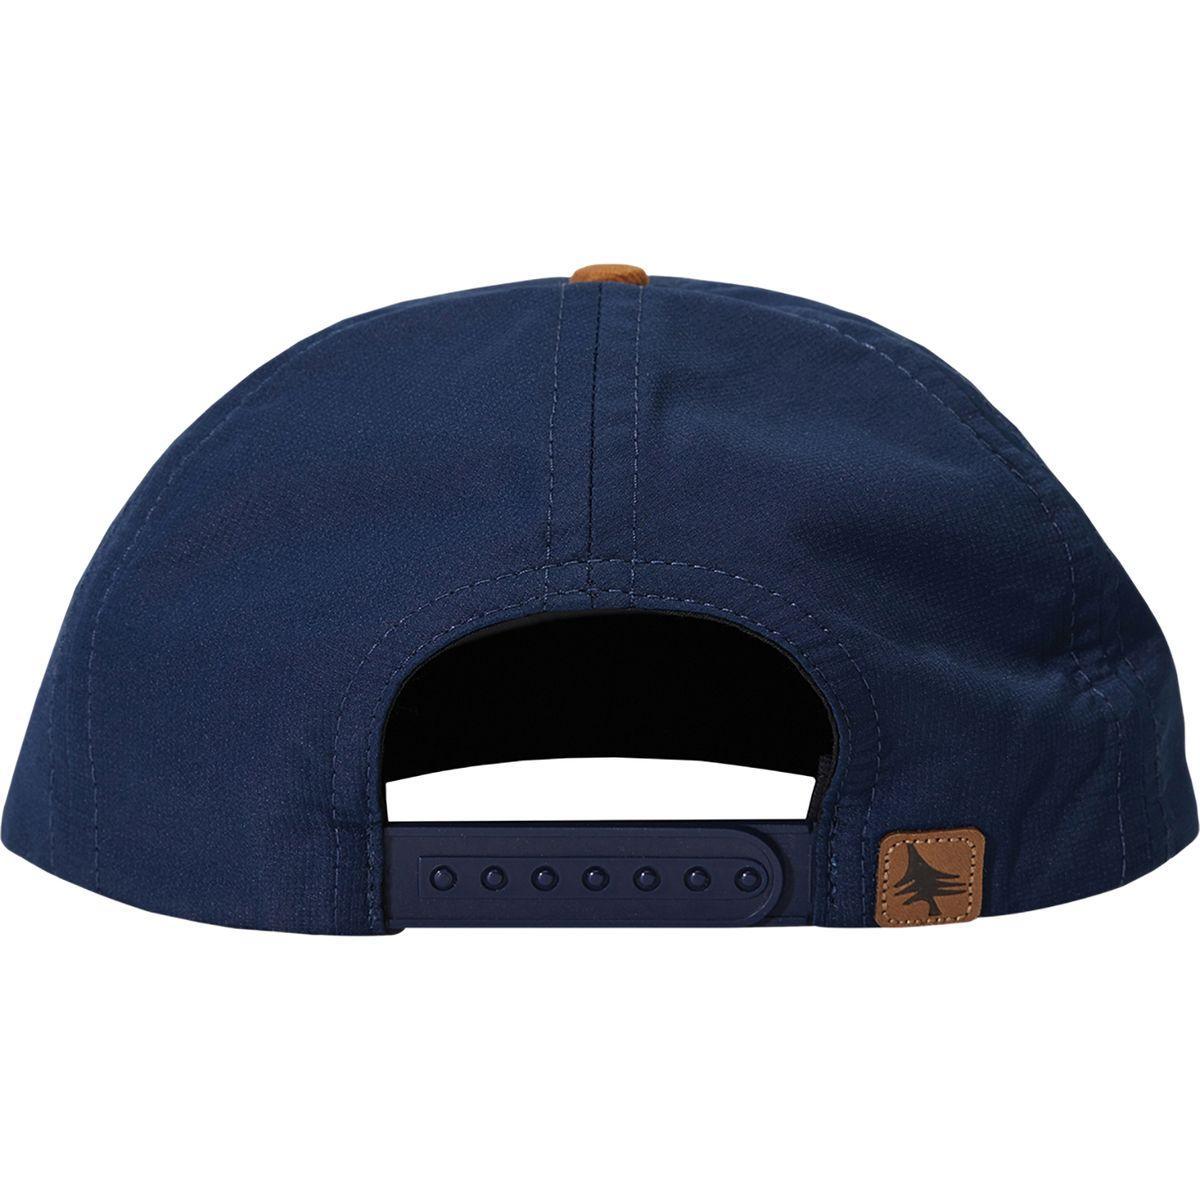 de0a8d01ebc Lyst hippy tree peninsula snapback hat in blue for men jpg 1200x1200 Corona  hippytree mens station